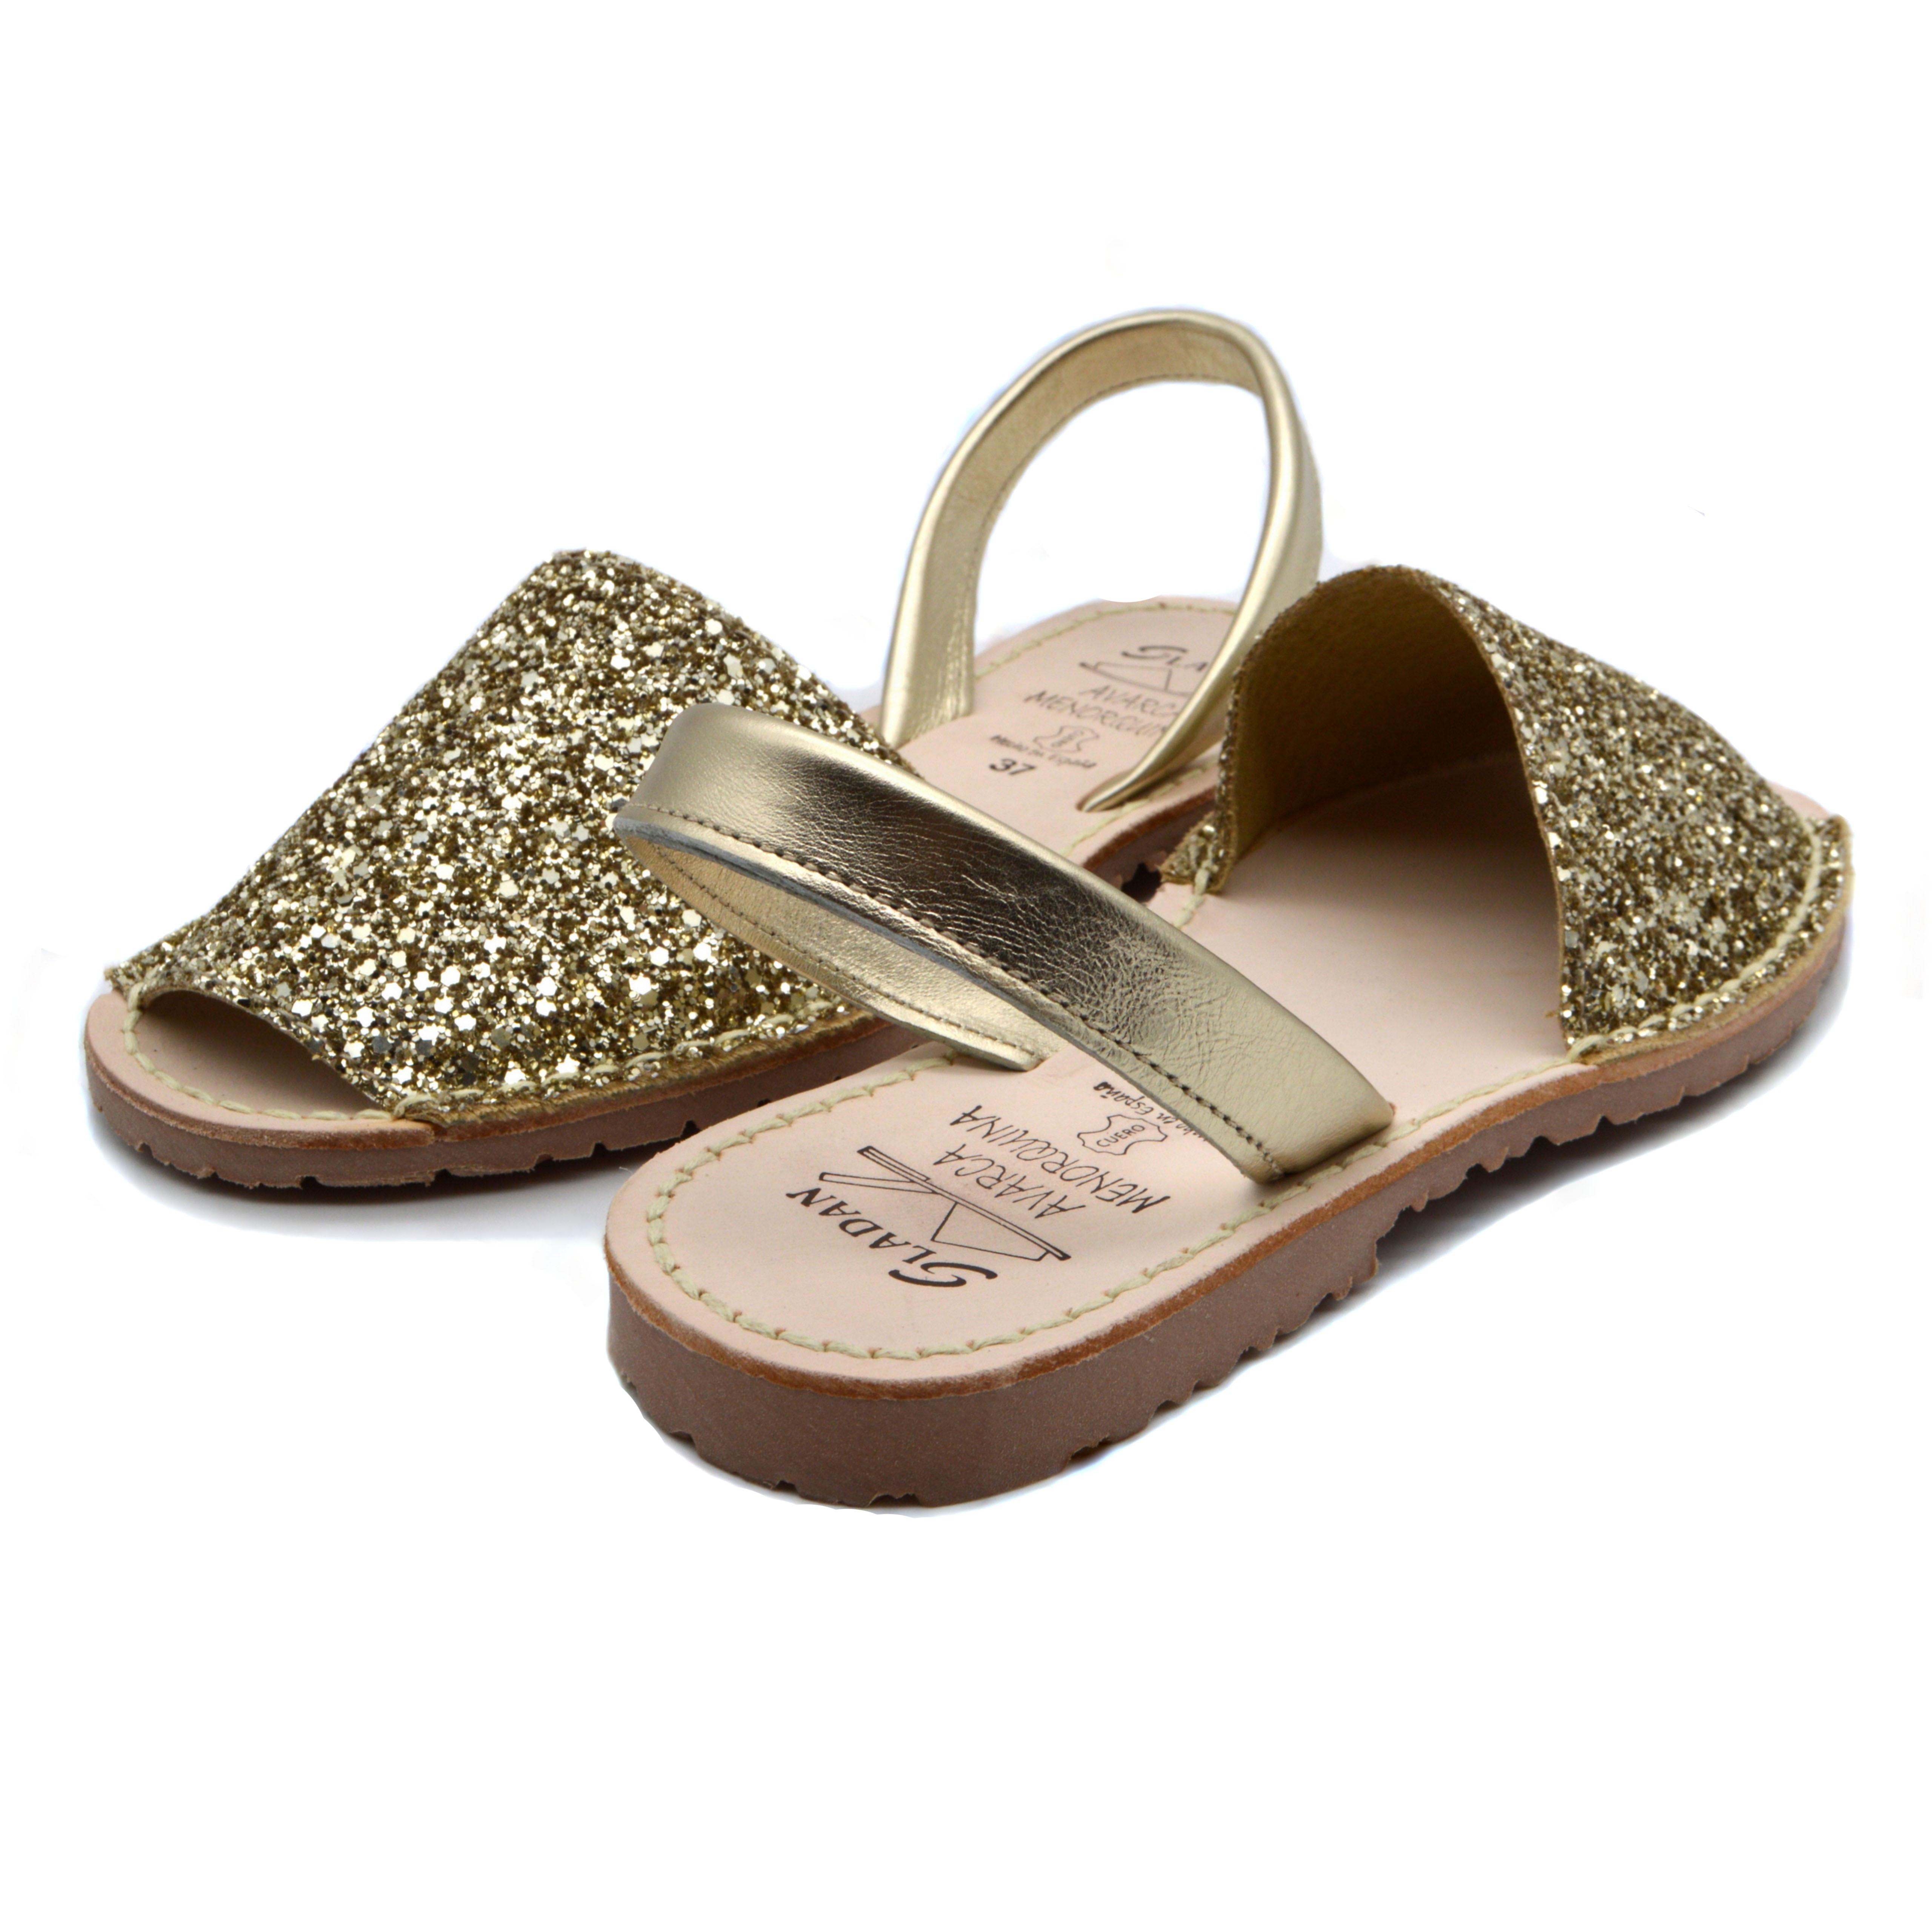 Glitter Minorchine Basic Le Ed Create SpagnaComode In Oro Eleganti tdhrQsC